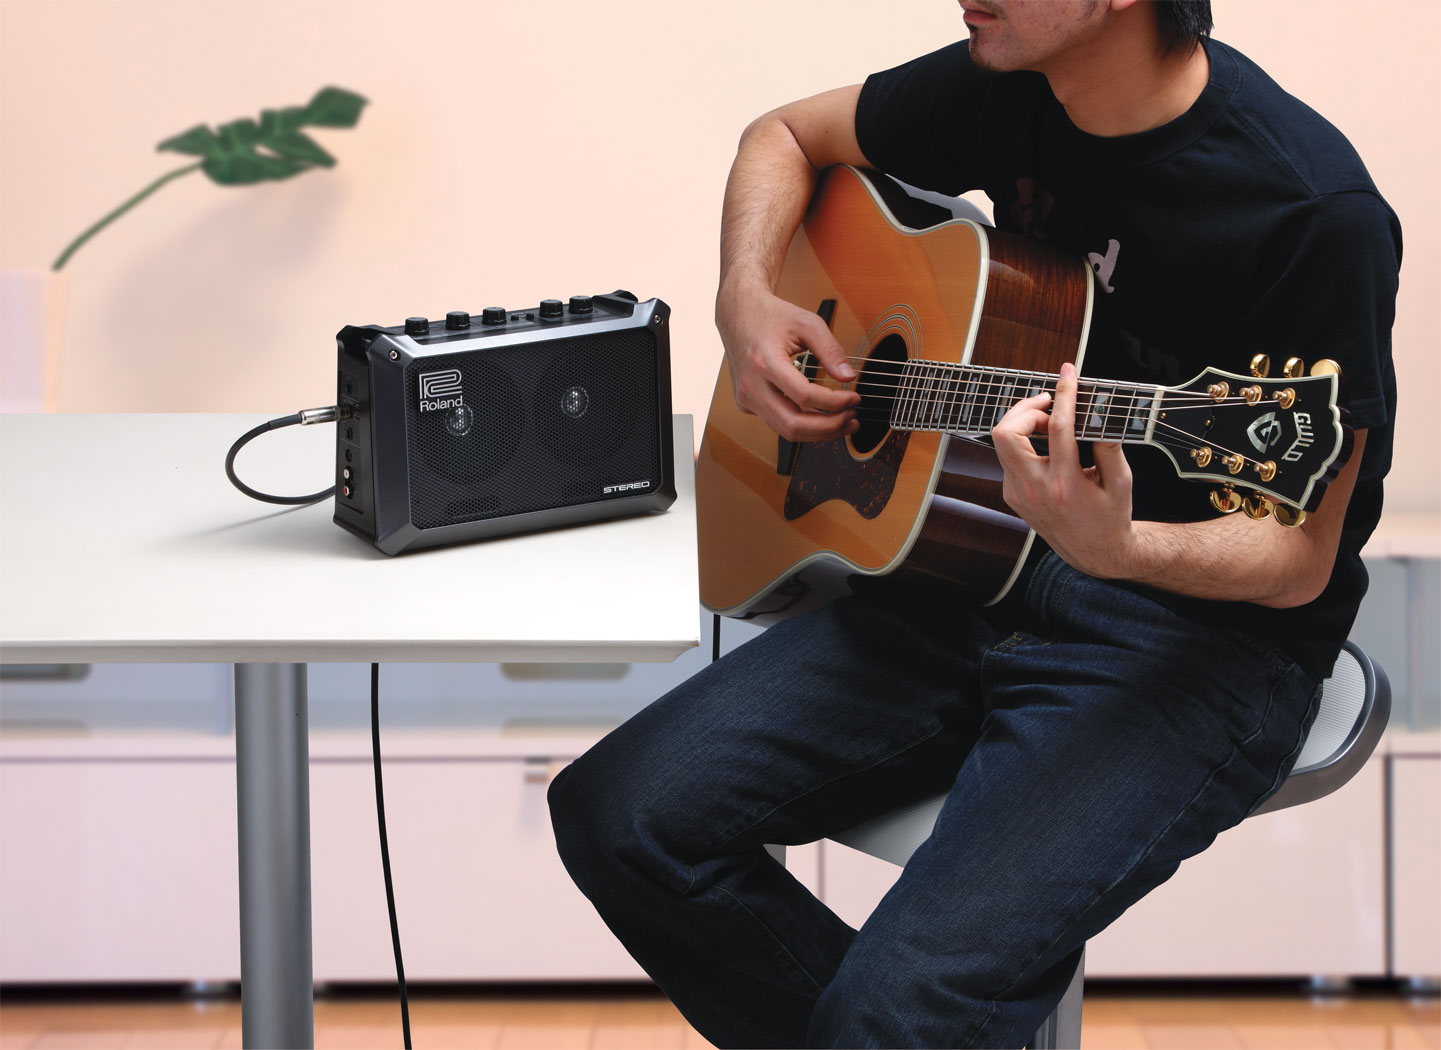 acoustic guitar and drum machine